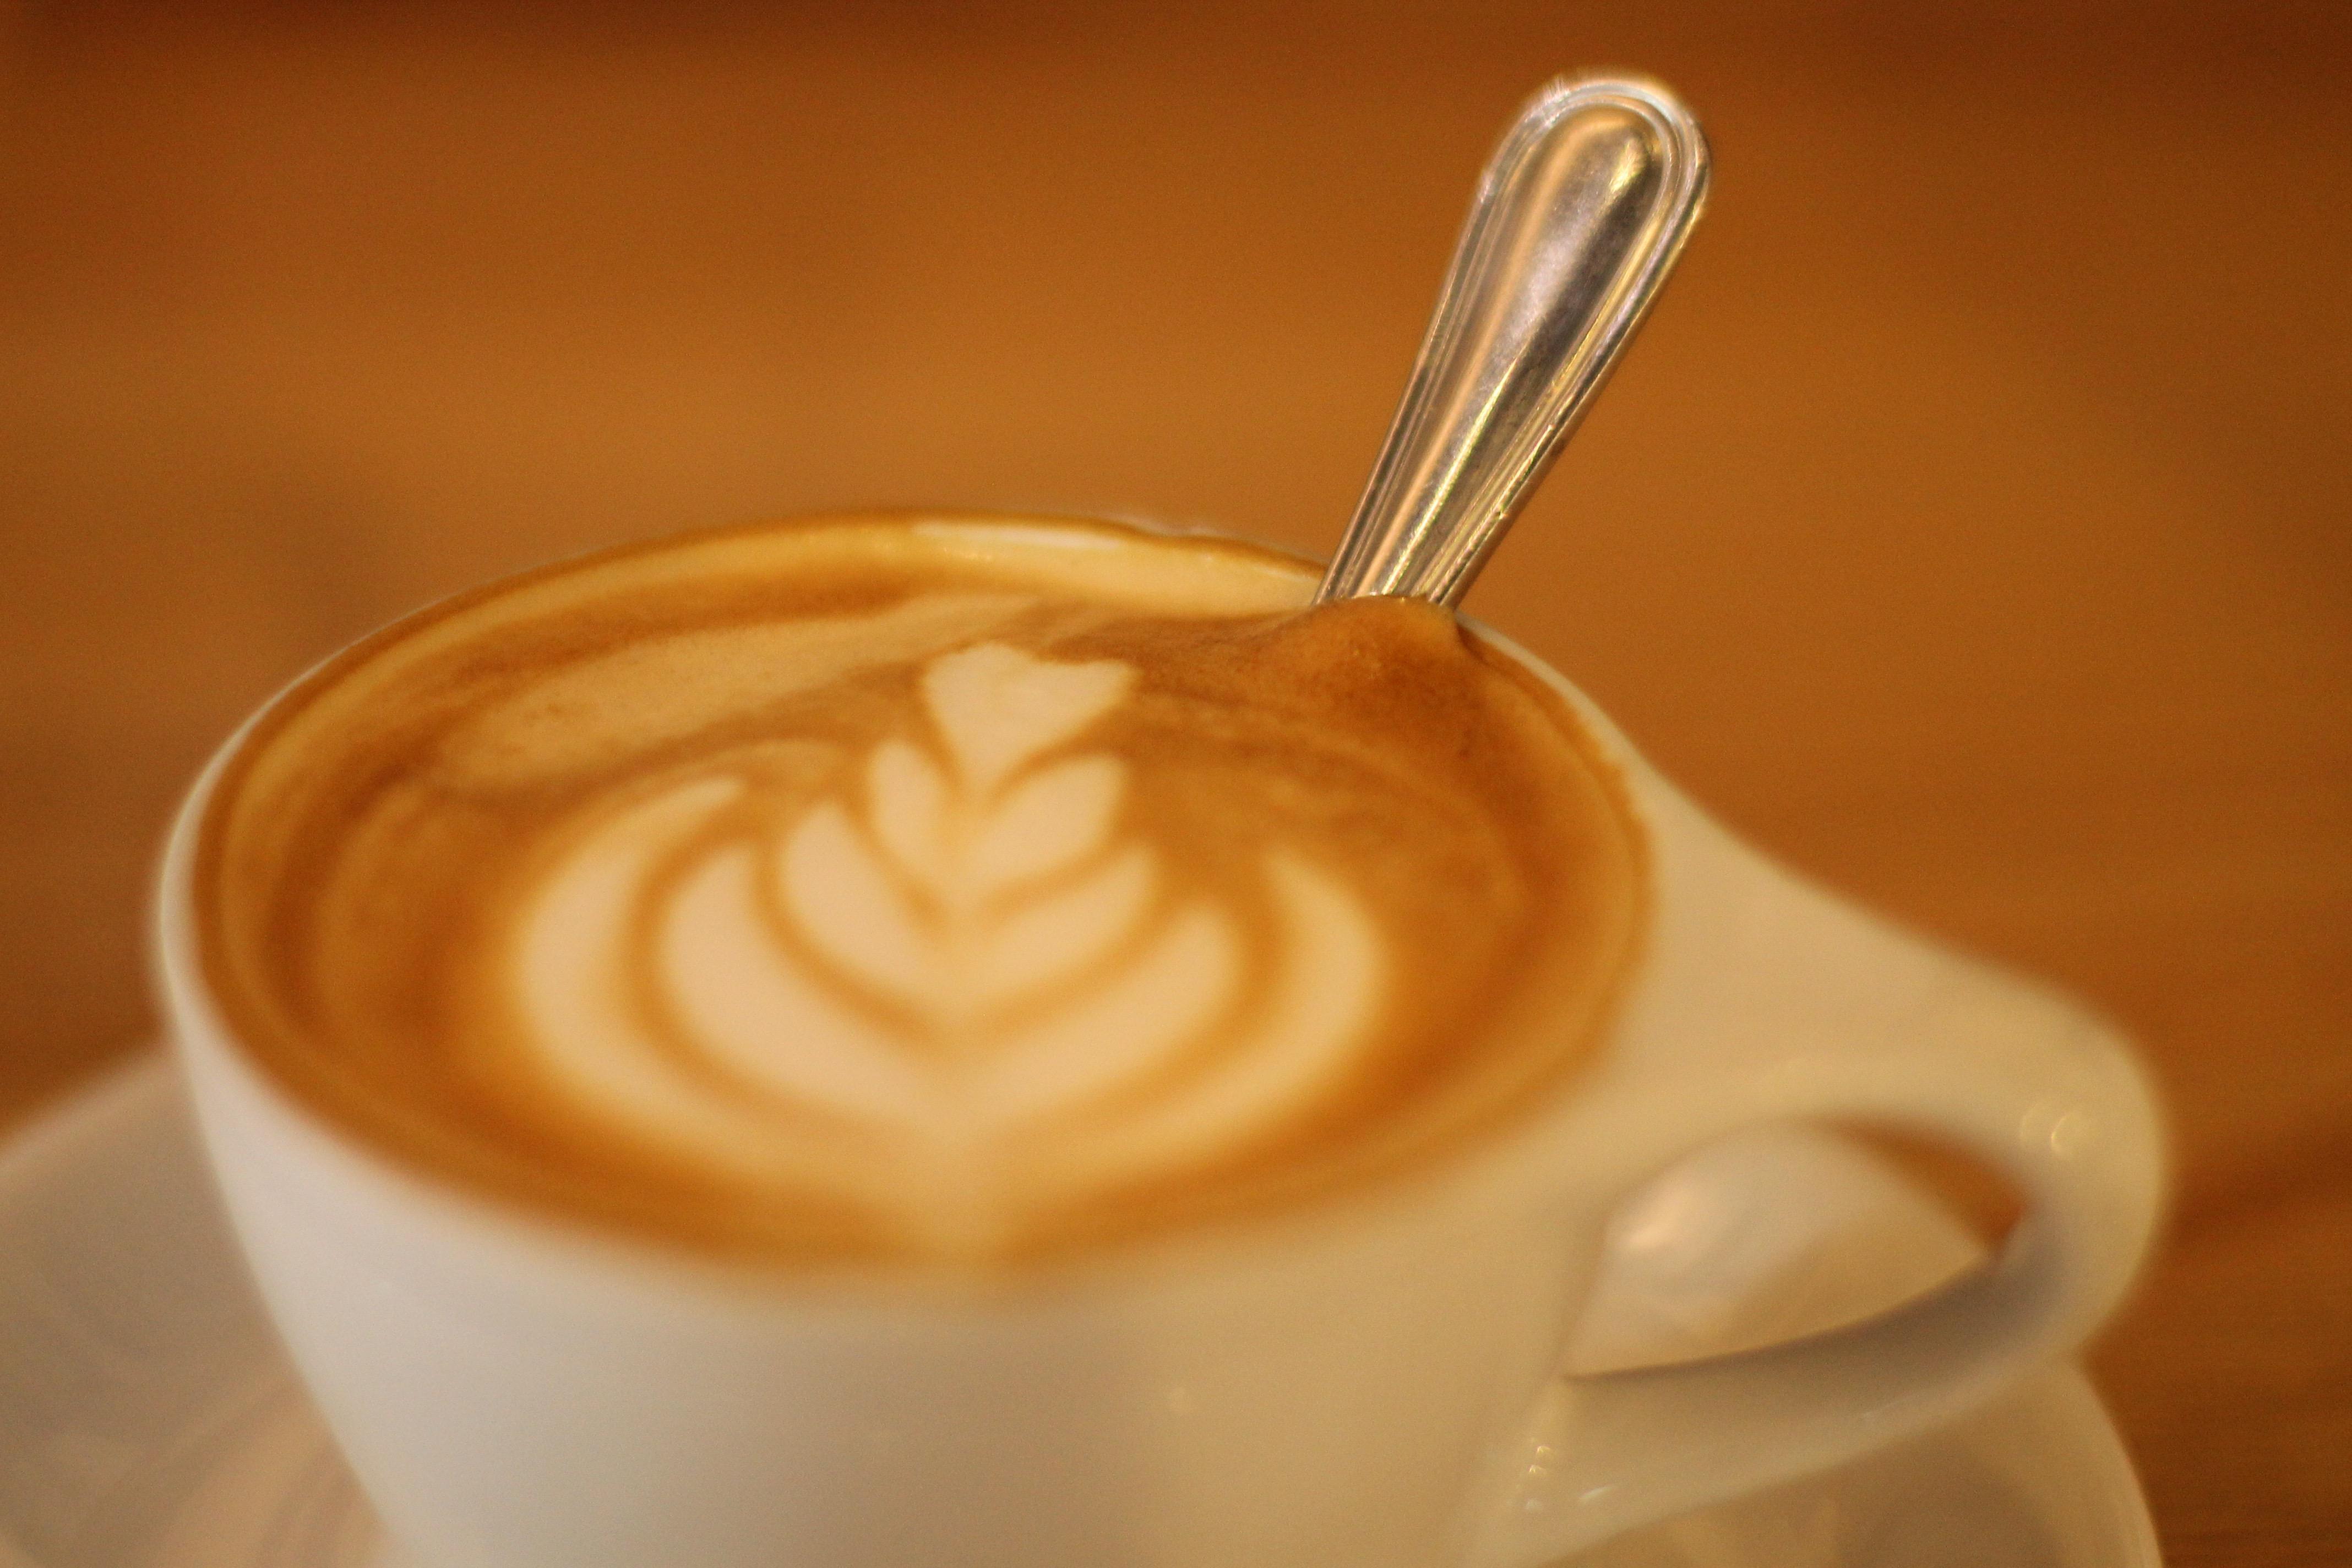 Northwest Arkansas boasts best coffee shops